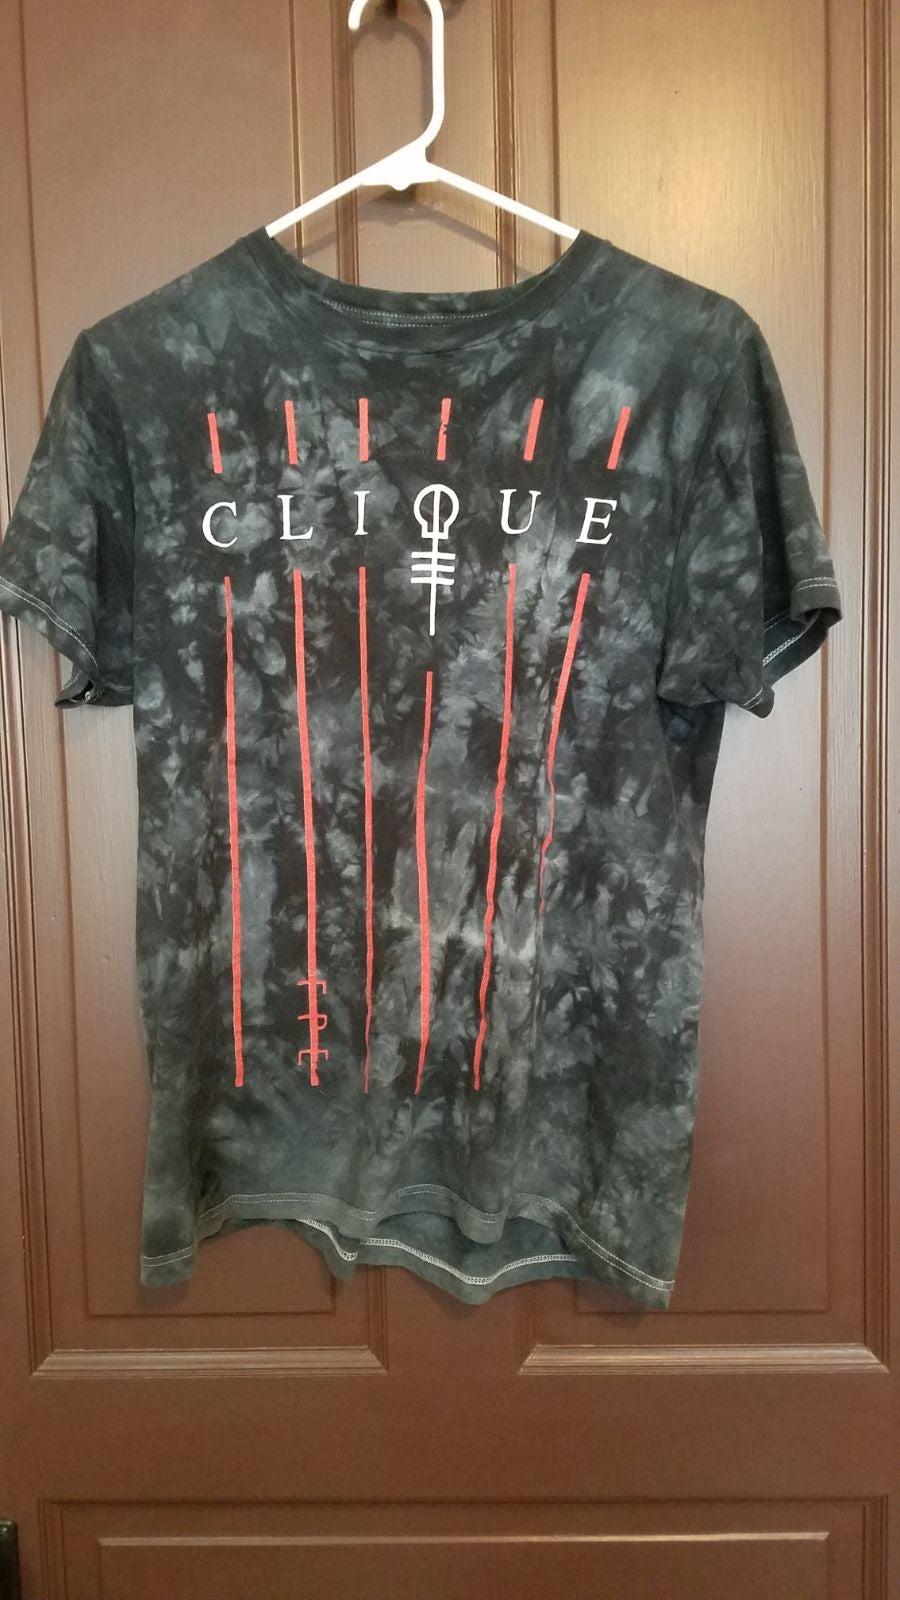 Goth boi clique tshirt